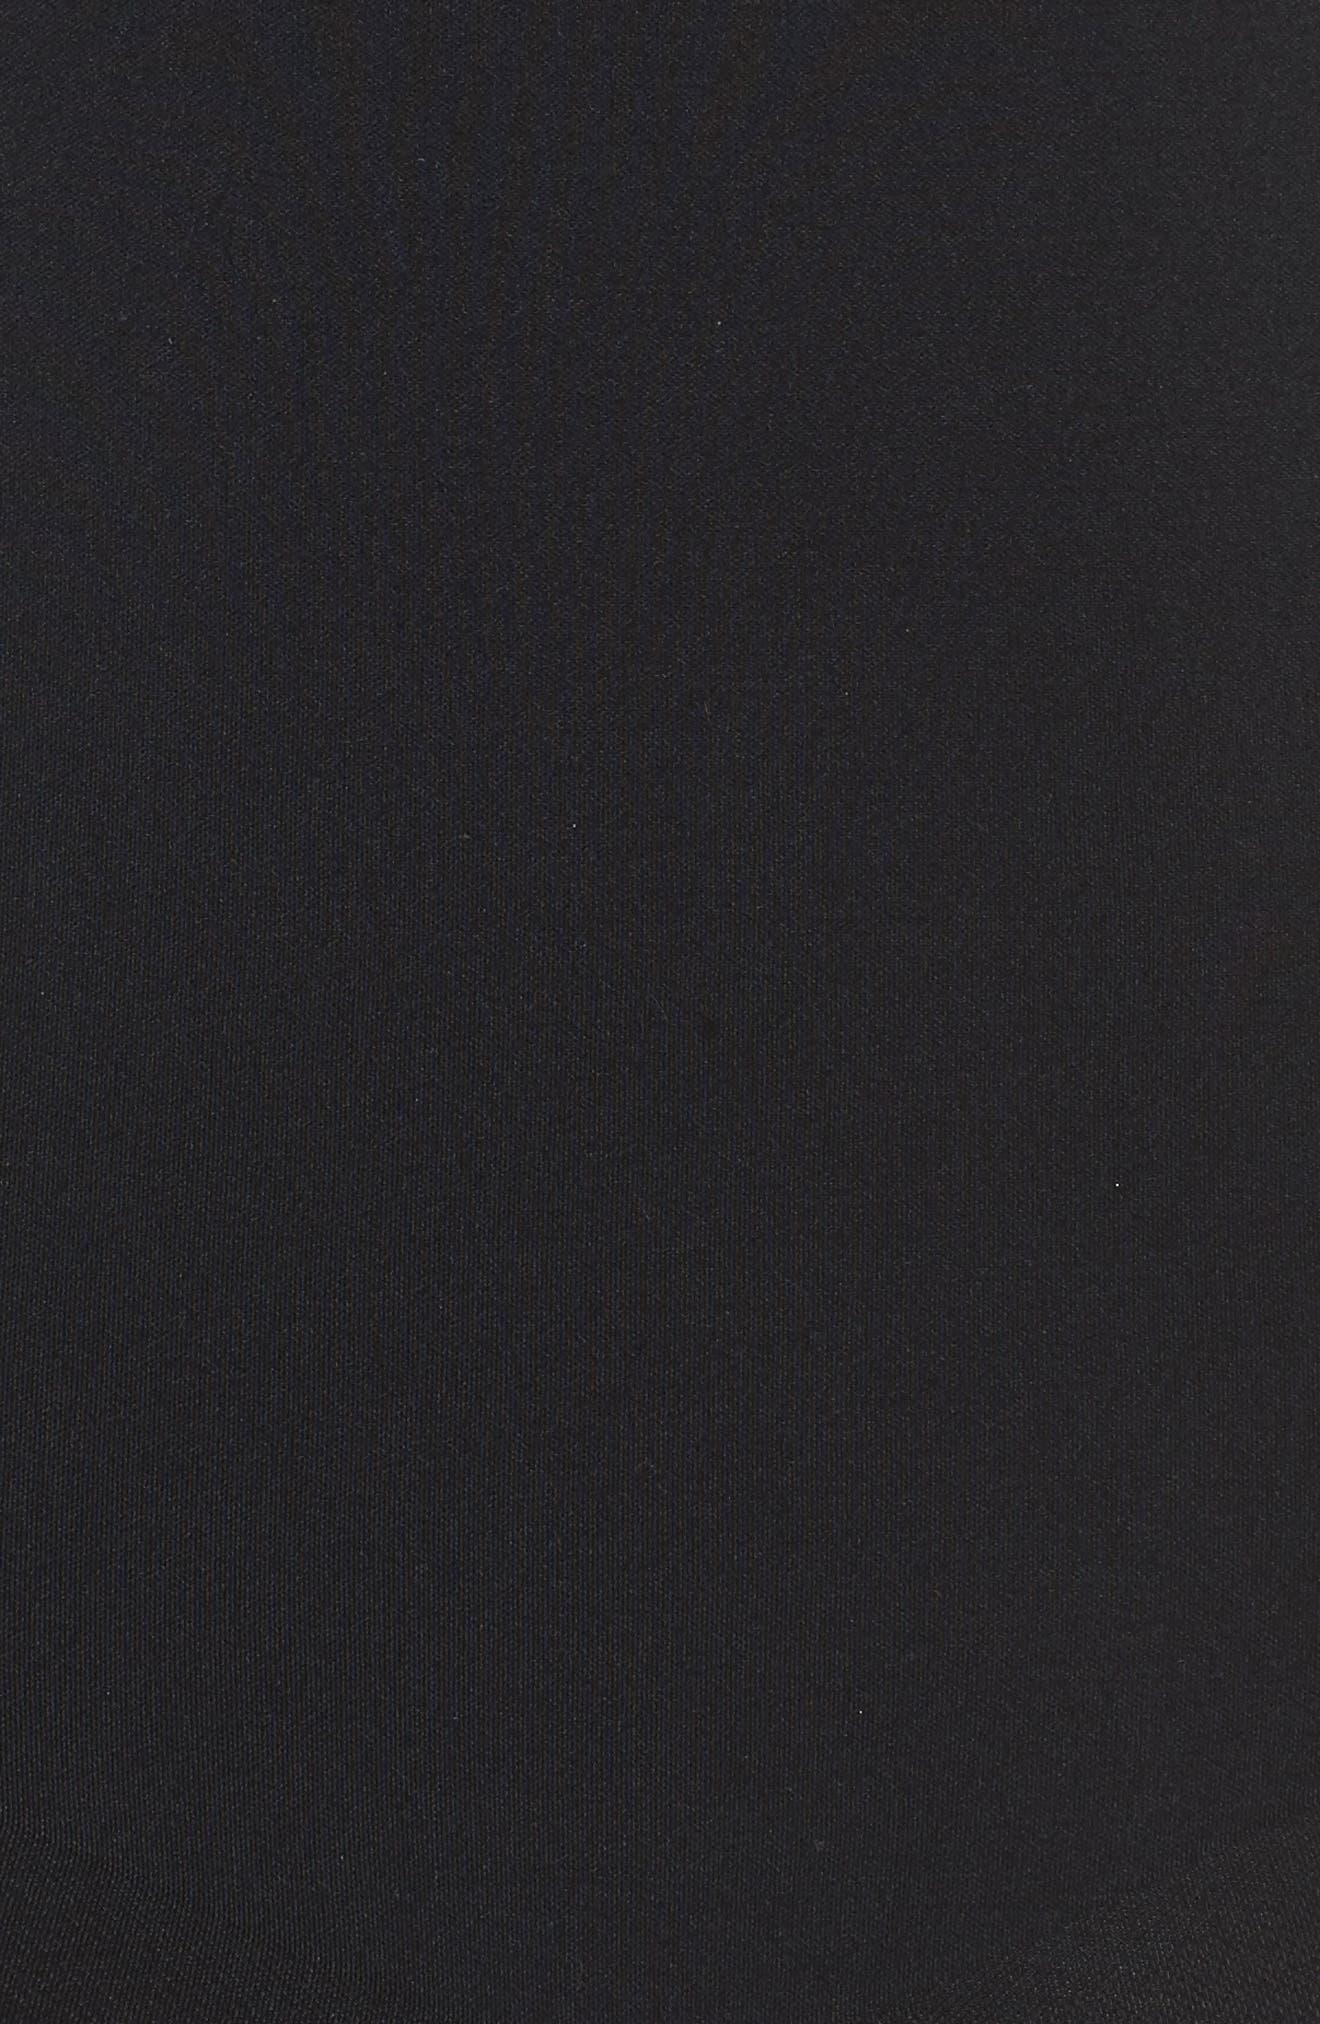 Oncore Mid Thigh Bodysuit,                             Alternate thumbnail 5, color,                             BLACK